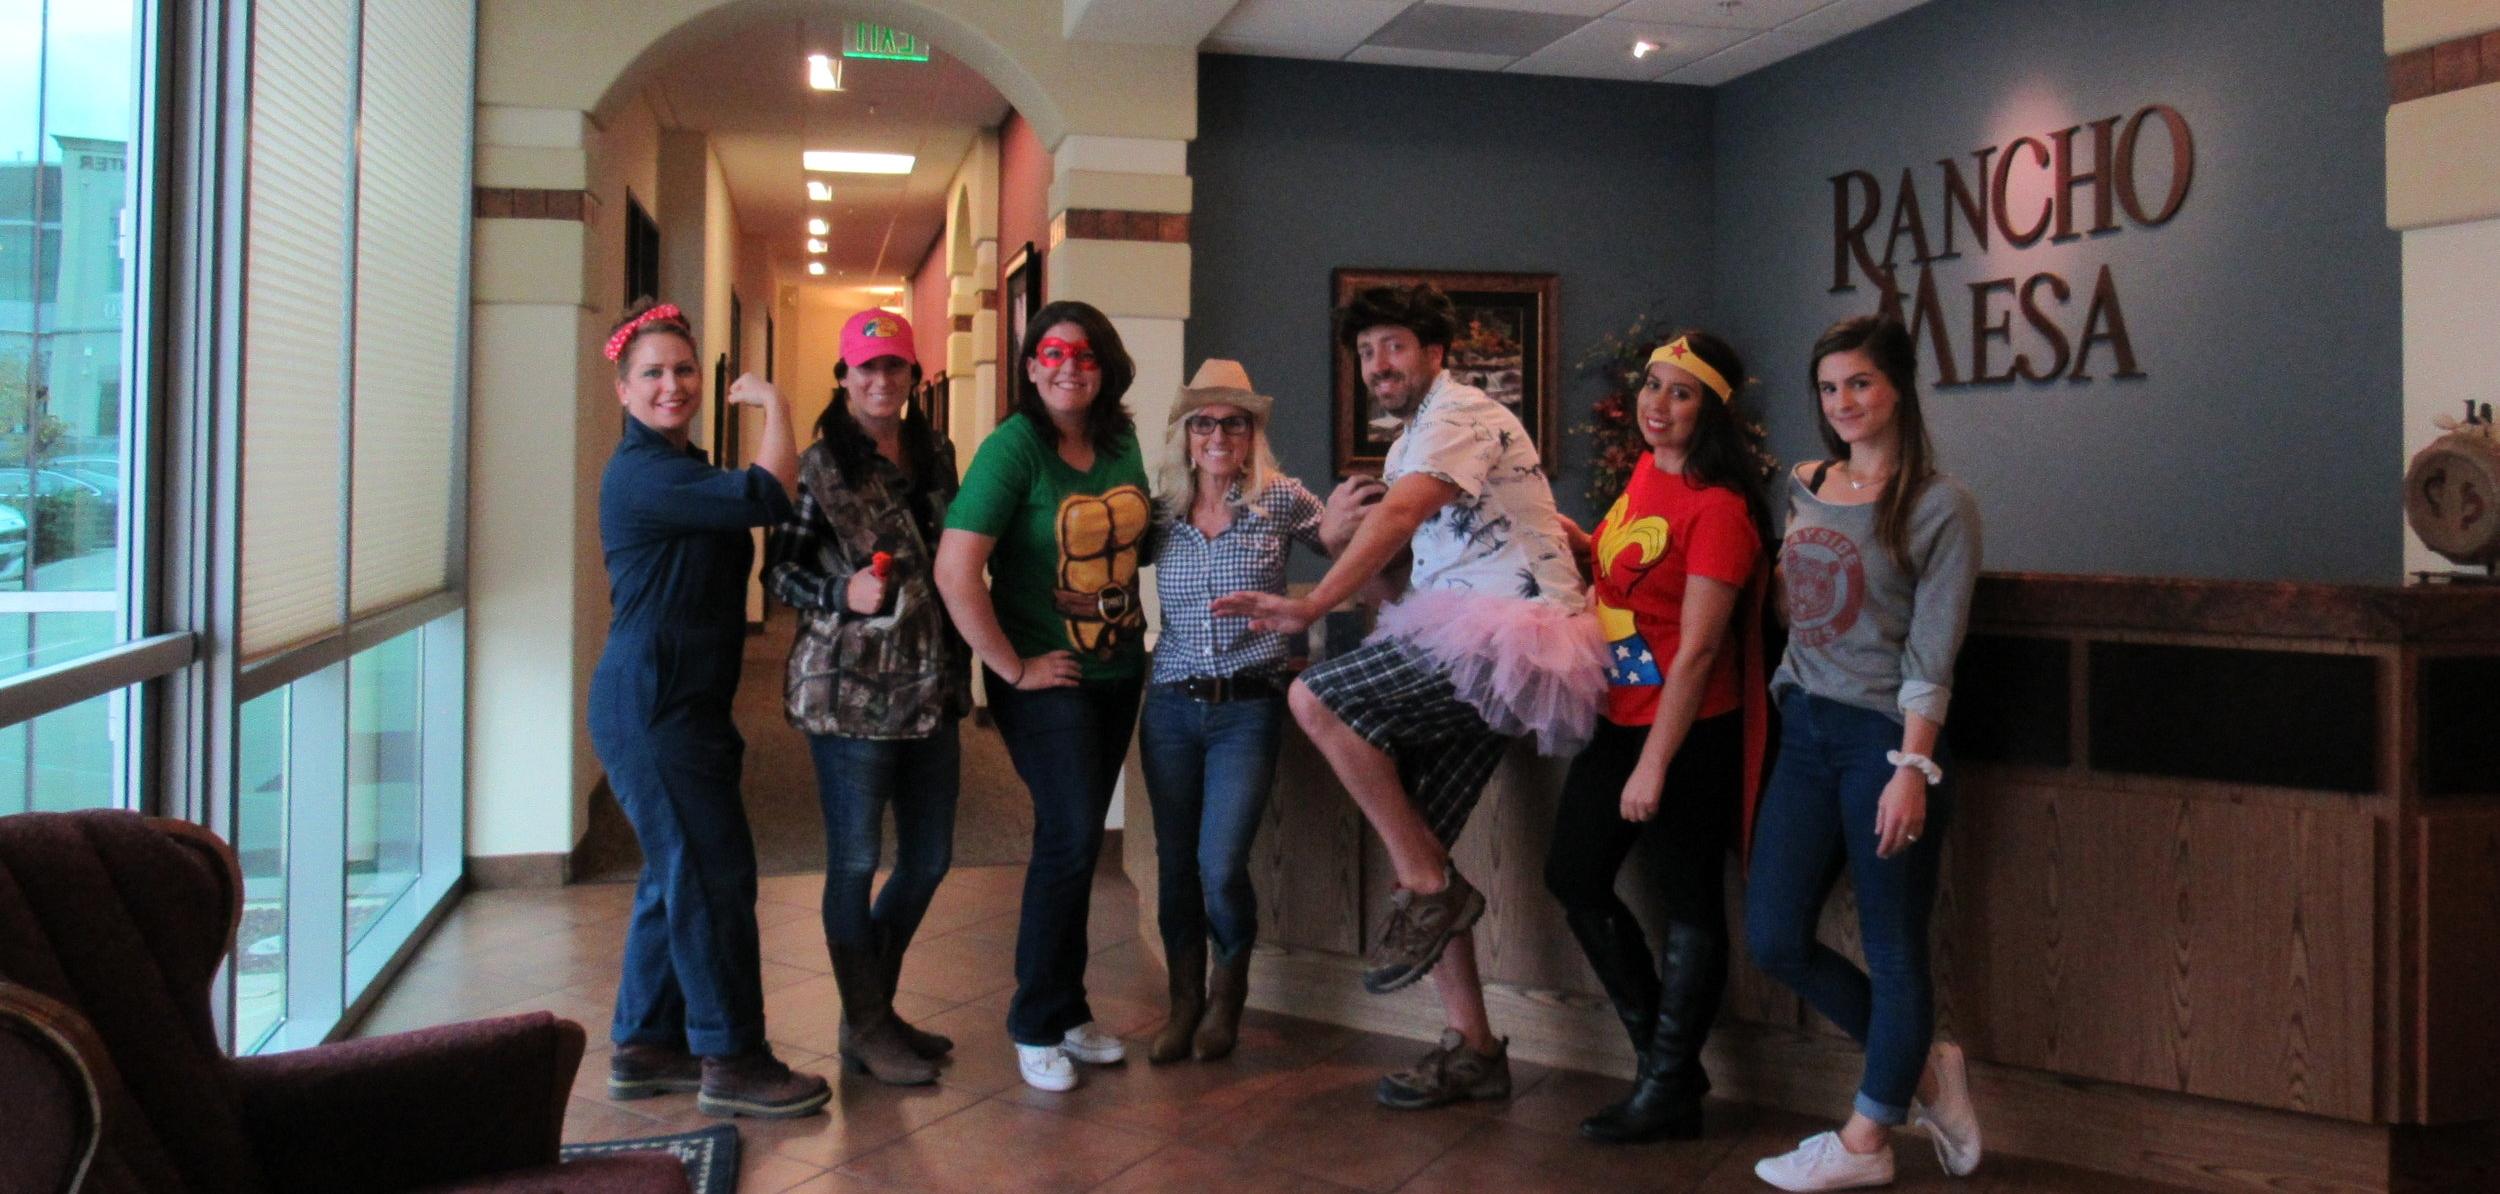 Left to right: Rosie the Riveter (Alyssa Burley), Hunter (Jessica Morton), Teenage Mutant Ninja Turtle (Christina Haake), Cowgirl (Lori Stone), Ace Ventura (John Parker), Wonder Woman (Brittani Kyriss), and Kelly Kapowski (Sierra Pedersen)